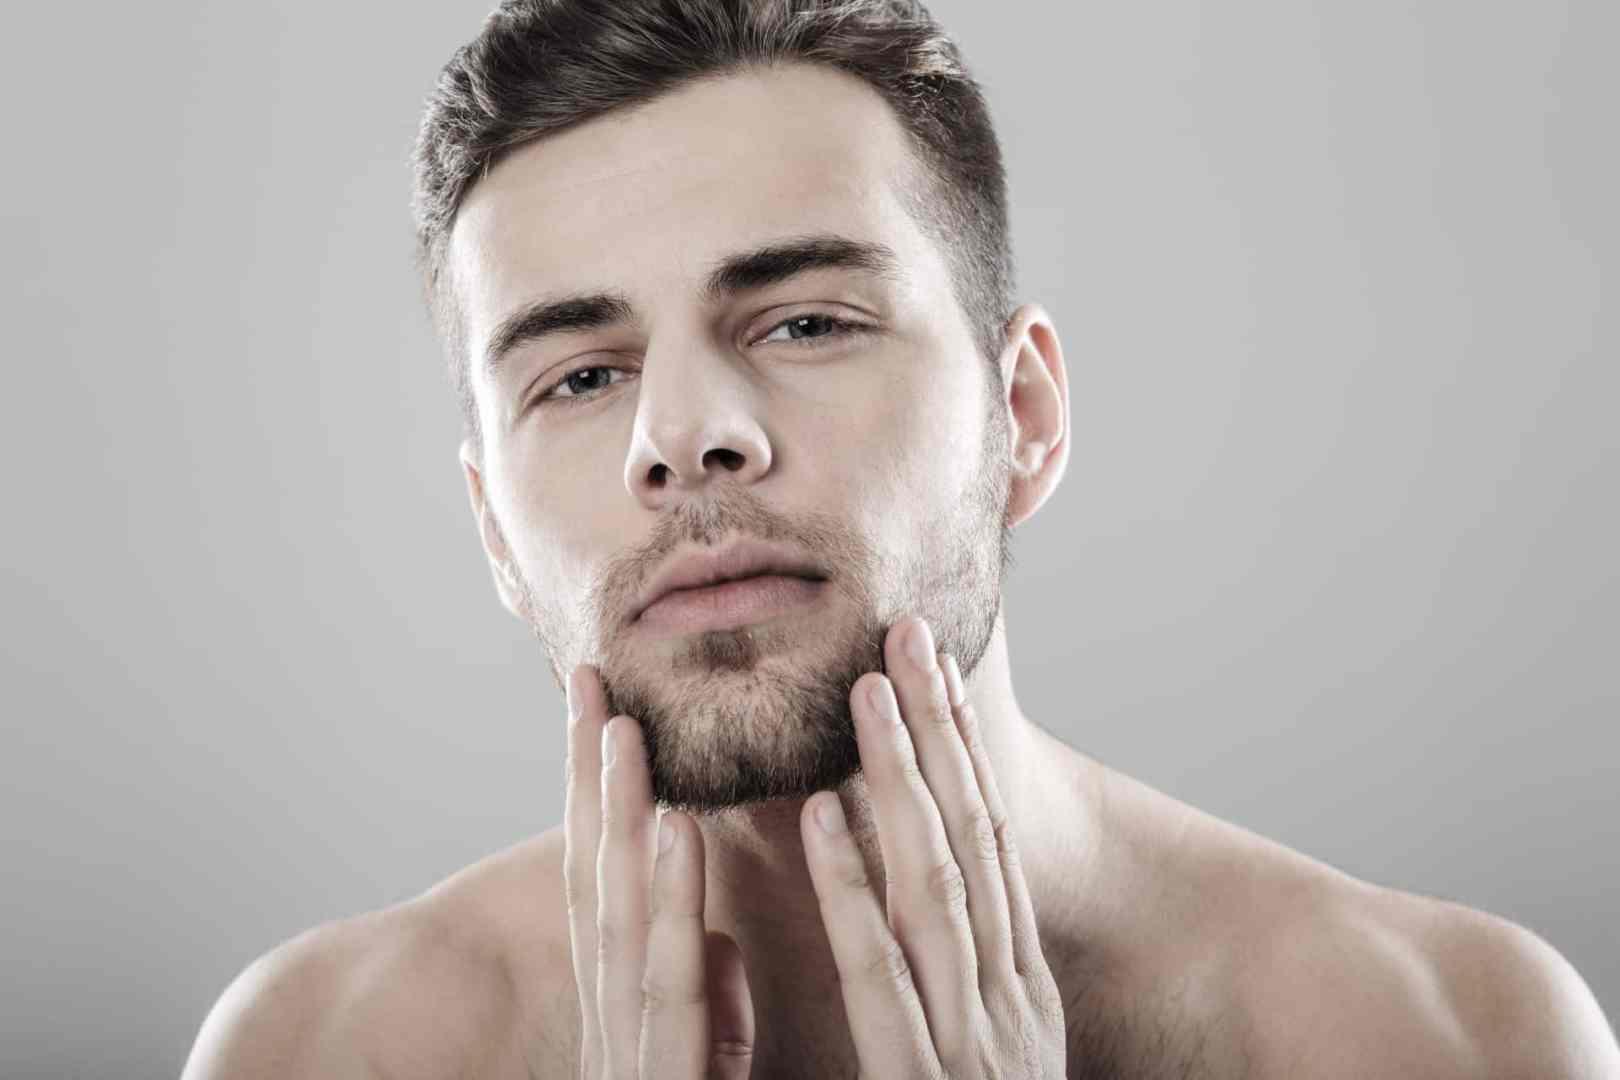 Managing oily skin